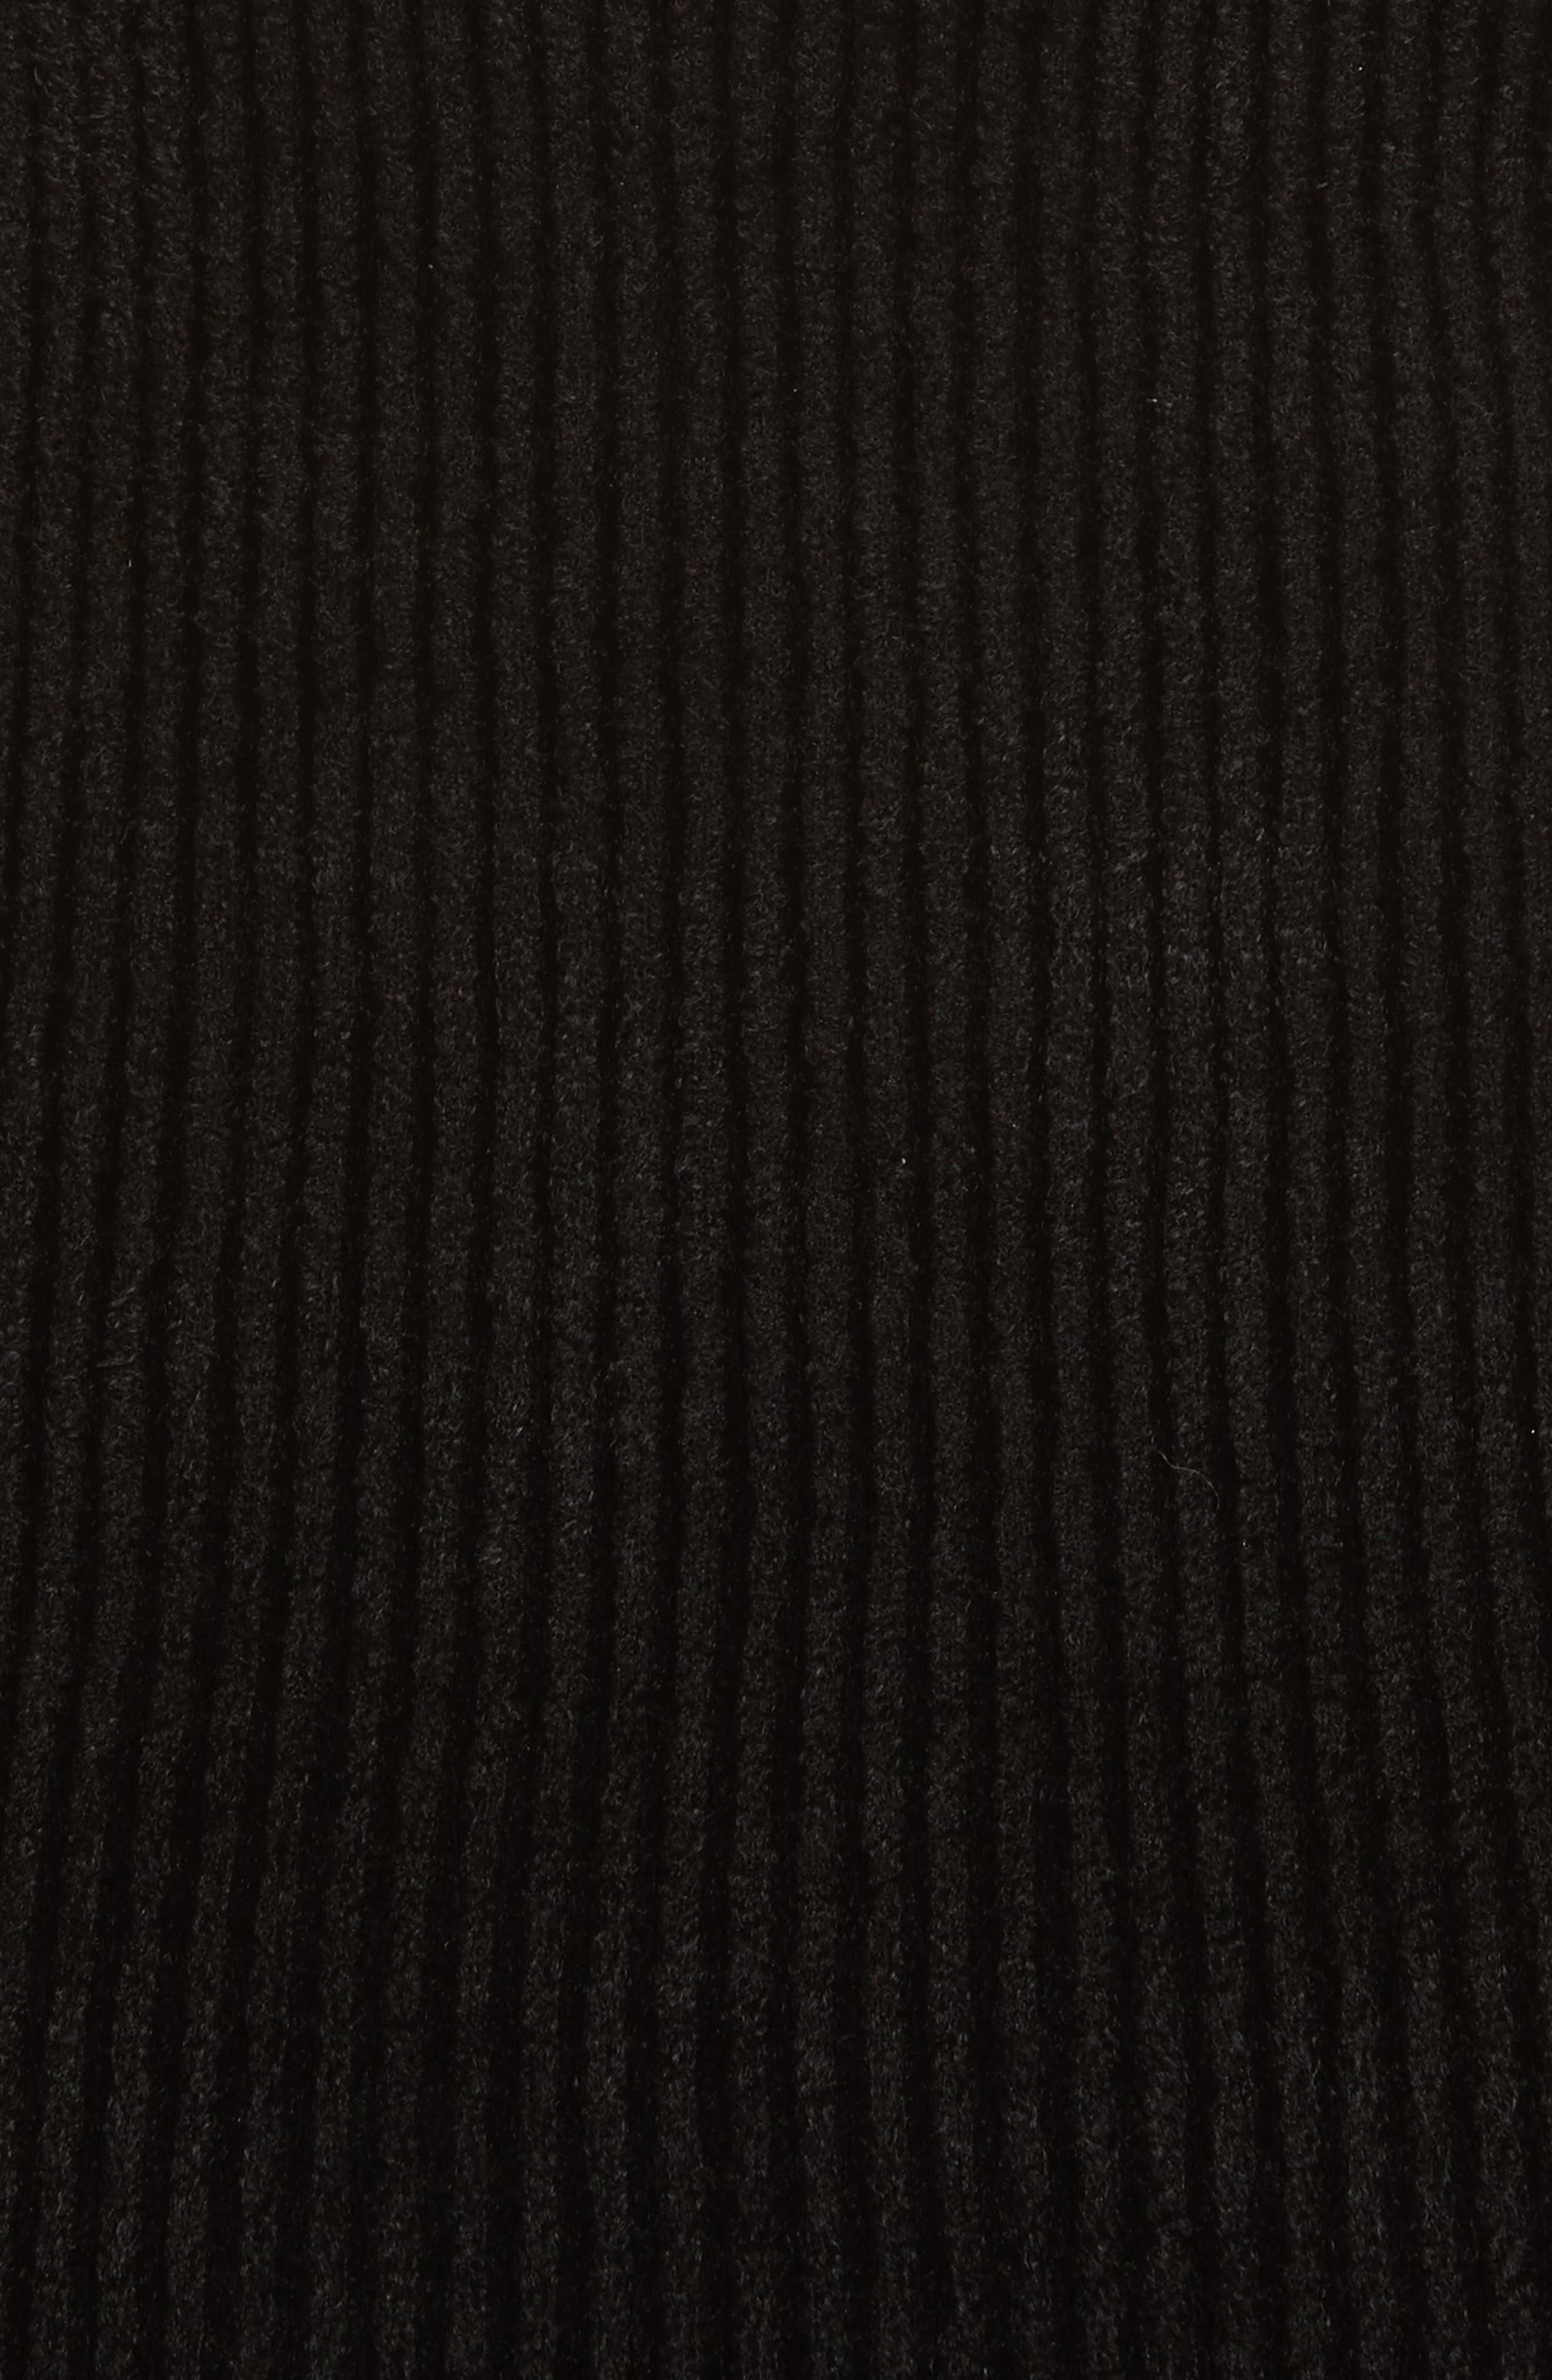 Velveteen Off the Shoulder Top,                             Alternate thumbnail 5, color,                             Black